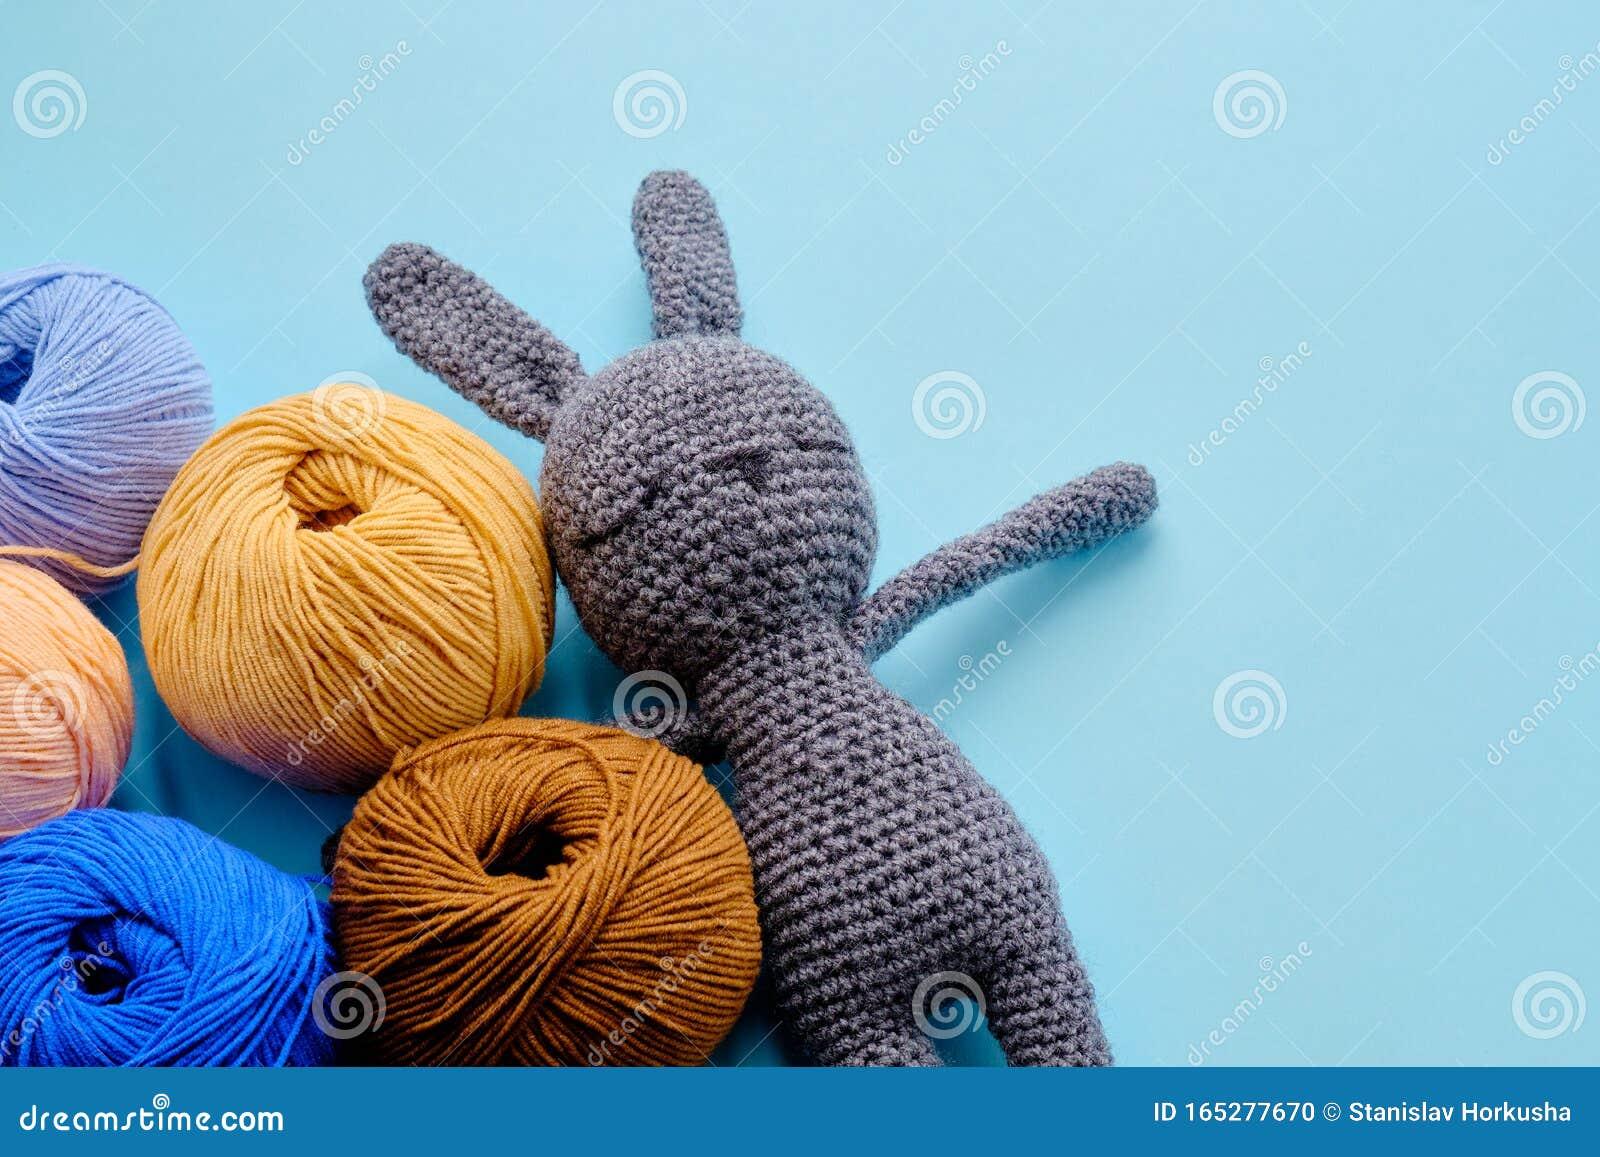 Amigurumi bunny/ crochet bunny with a skirt/ crochet toy/ crochet ... | 1155x1600